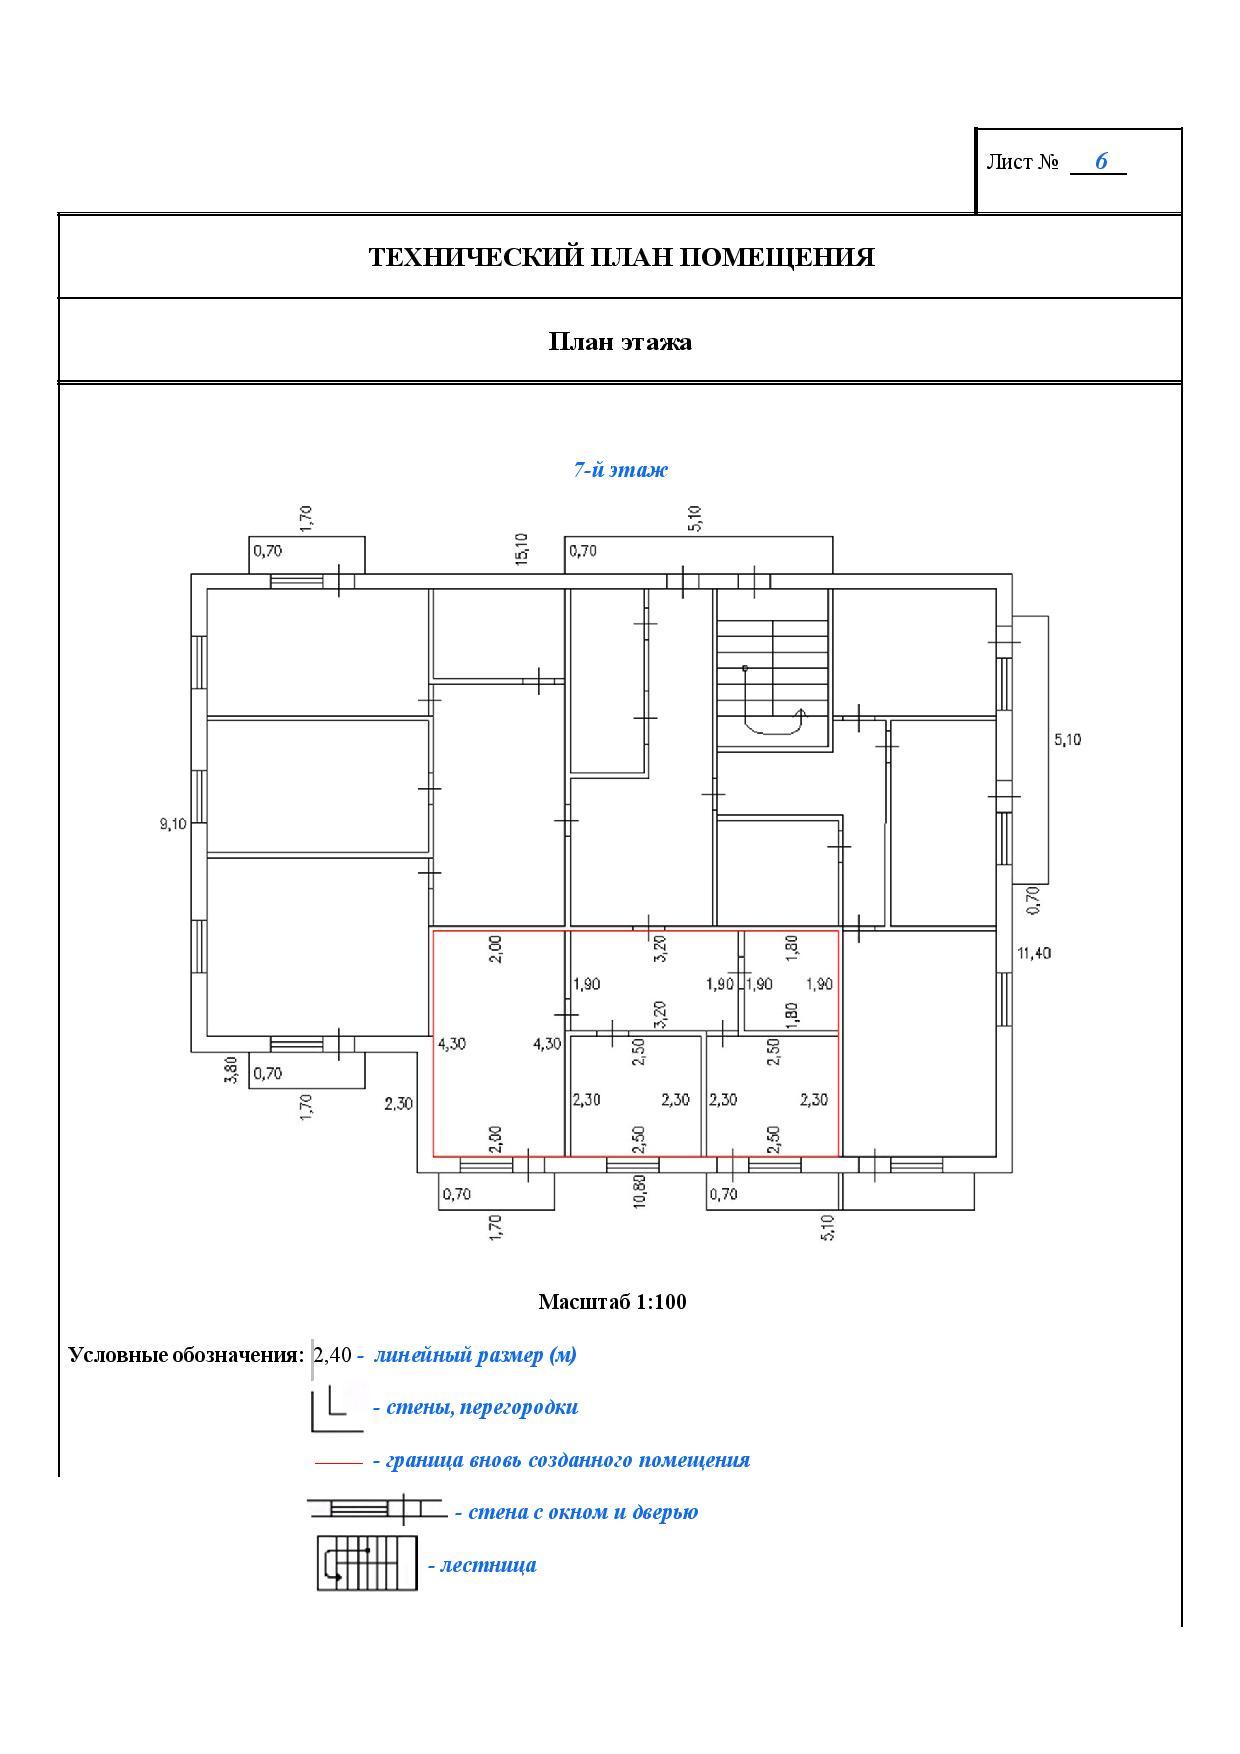 Образец технического плана дома